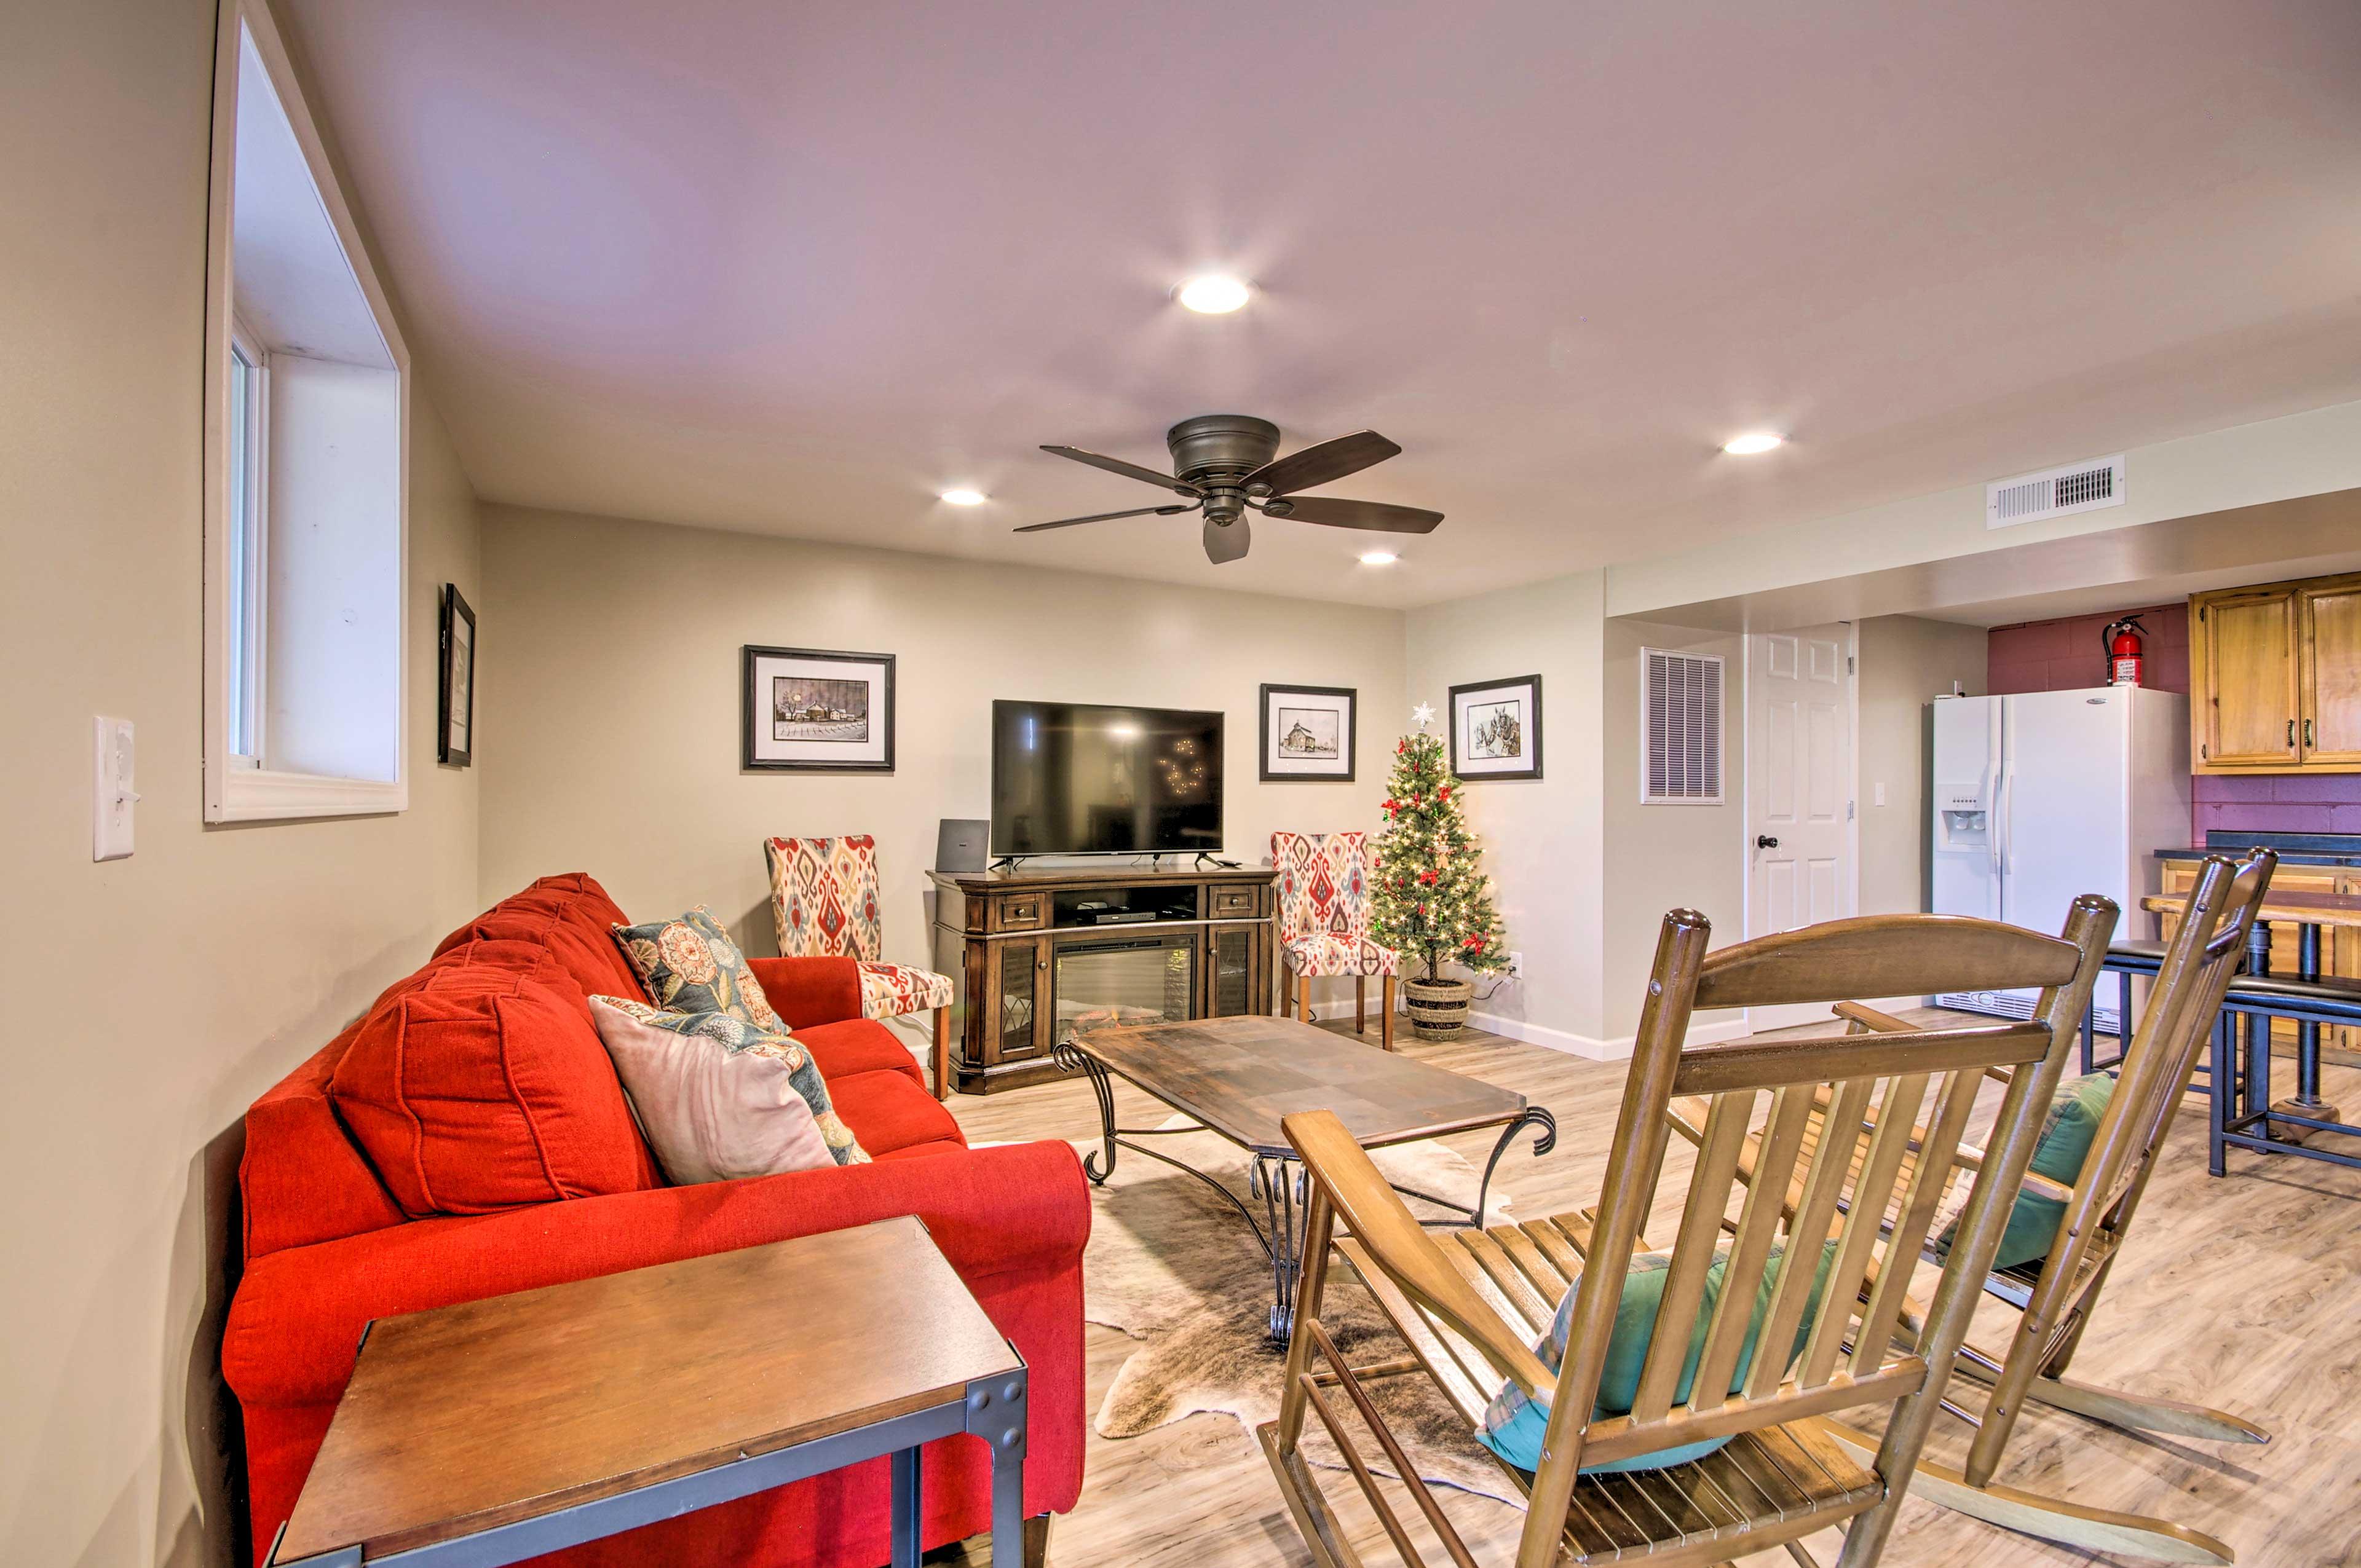 Living Room 2 | Smart TV